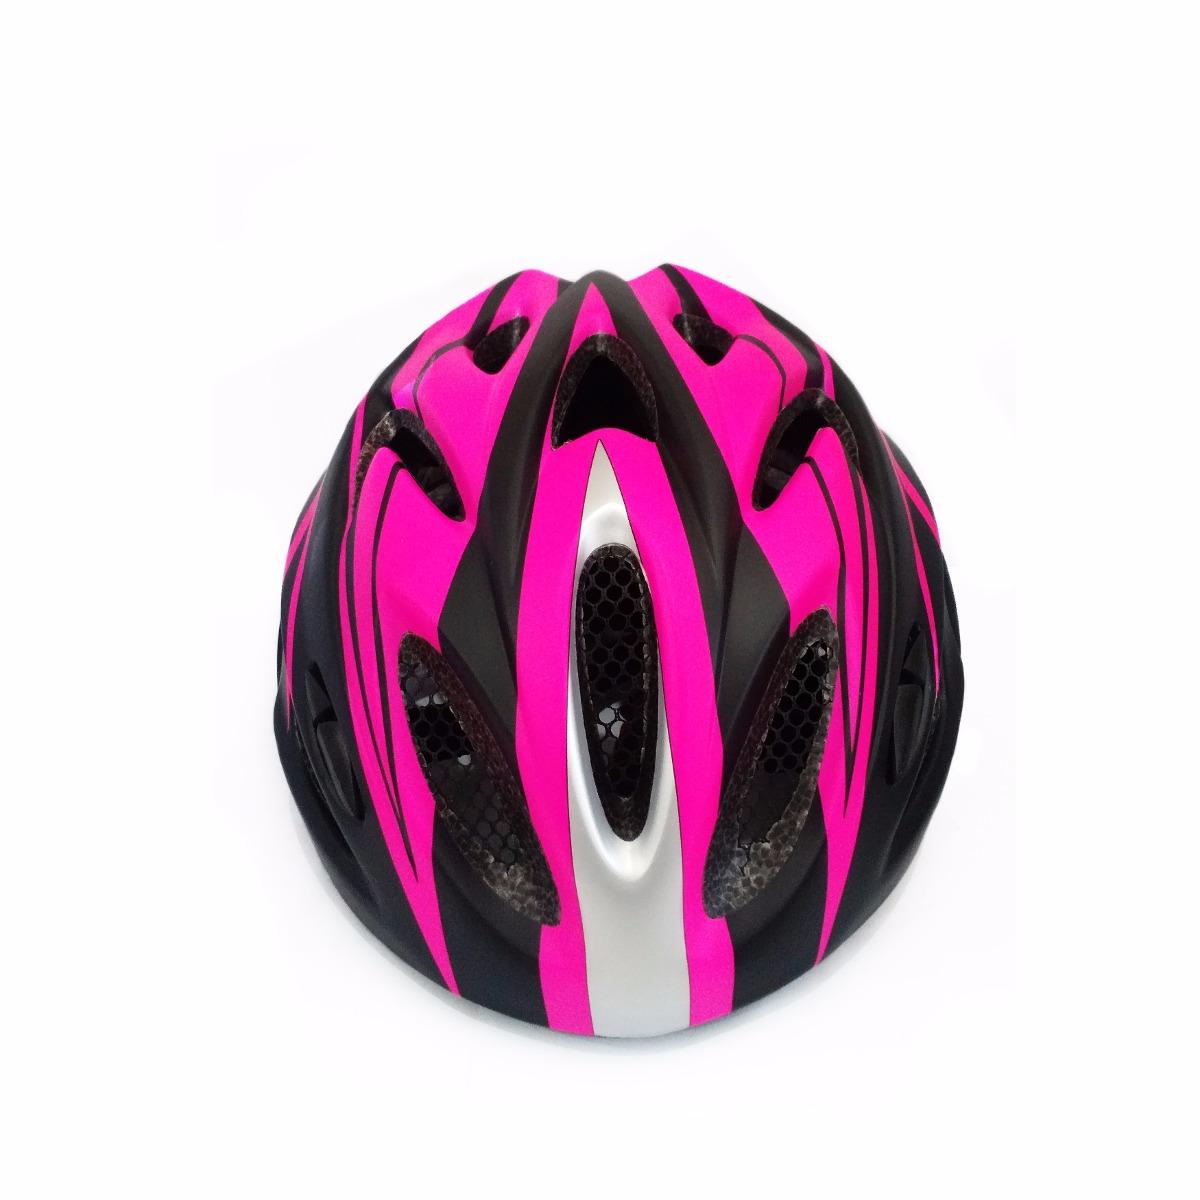 c155c8f36 capacete ciclismo feminino absolute bike c  led sinalizador. Carregando zoom .